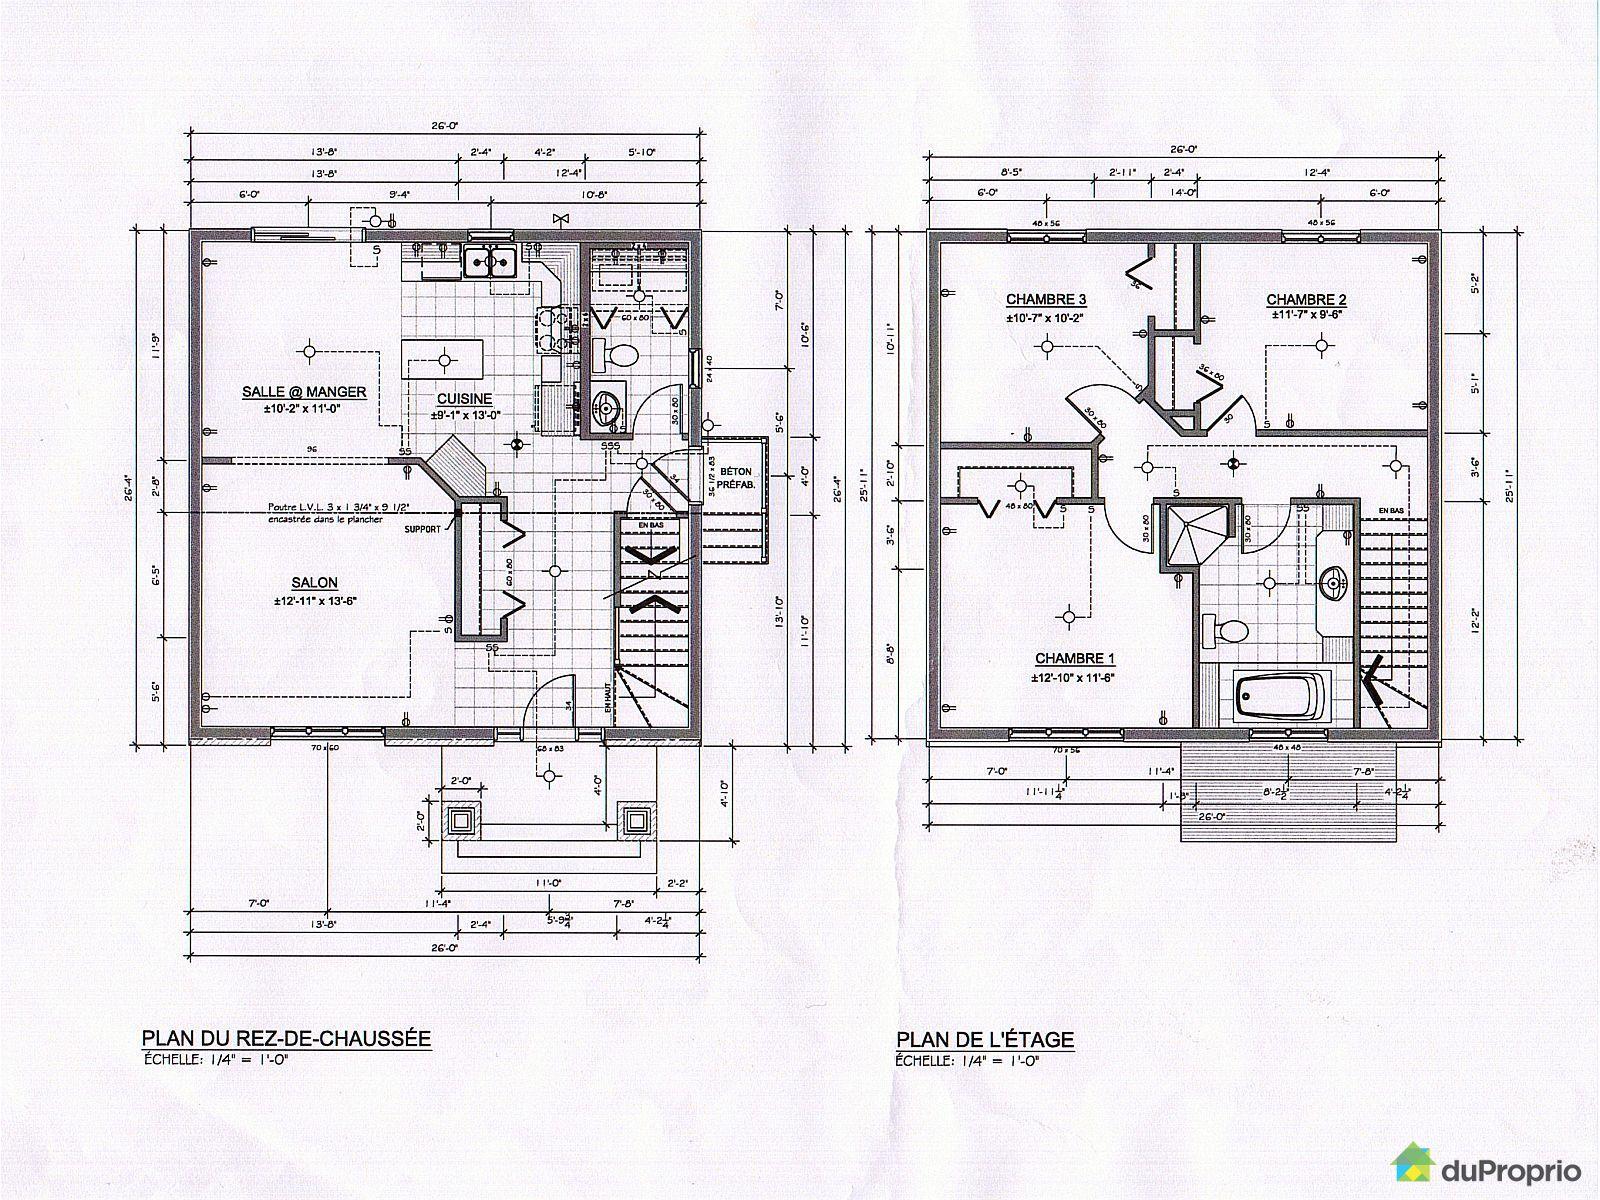 Maison vendu donnacona immobilier qu bec duproprio 574846 - Plan de maison quebec ...